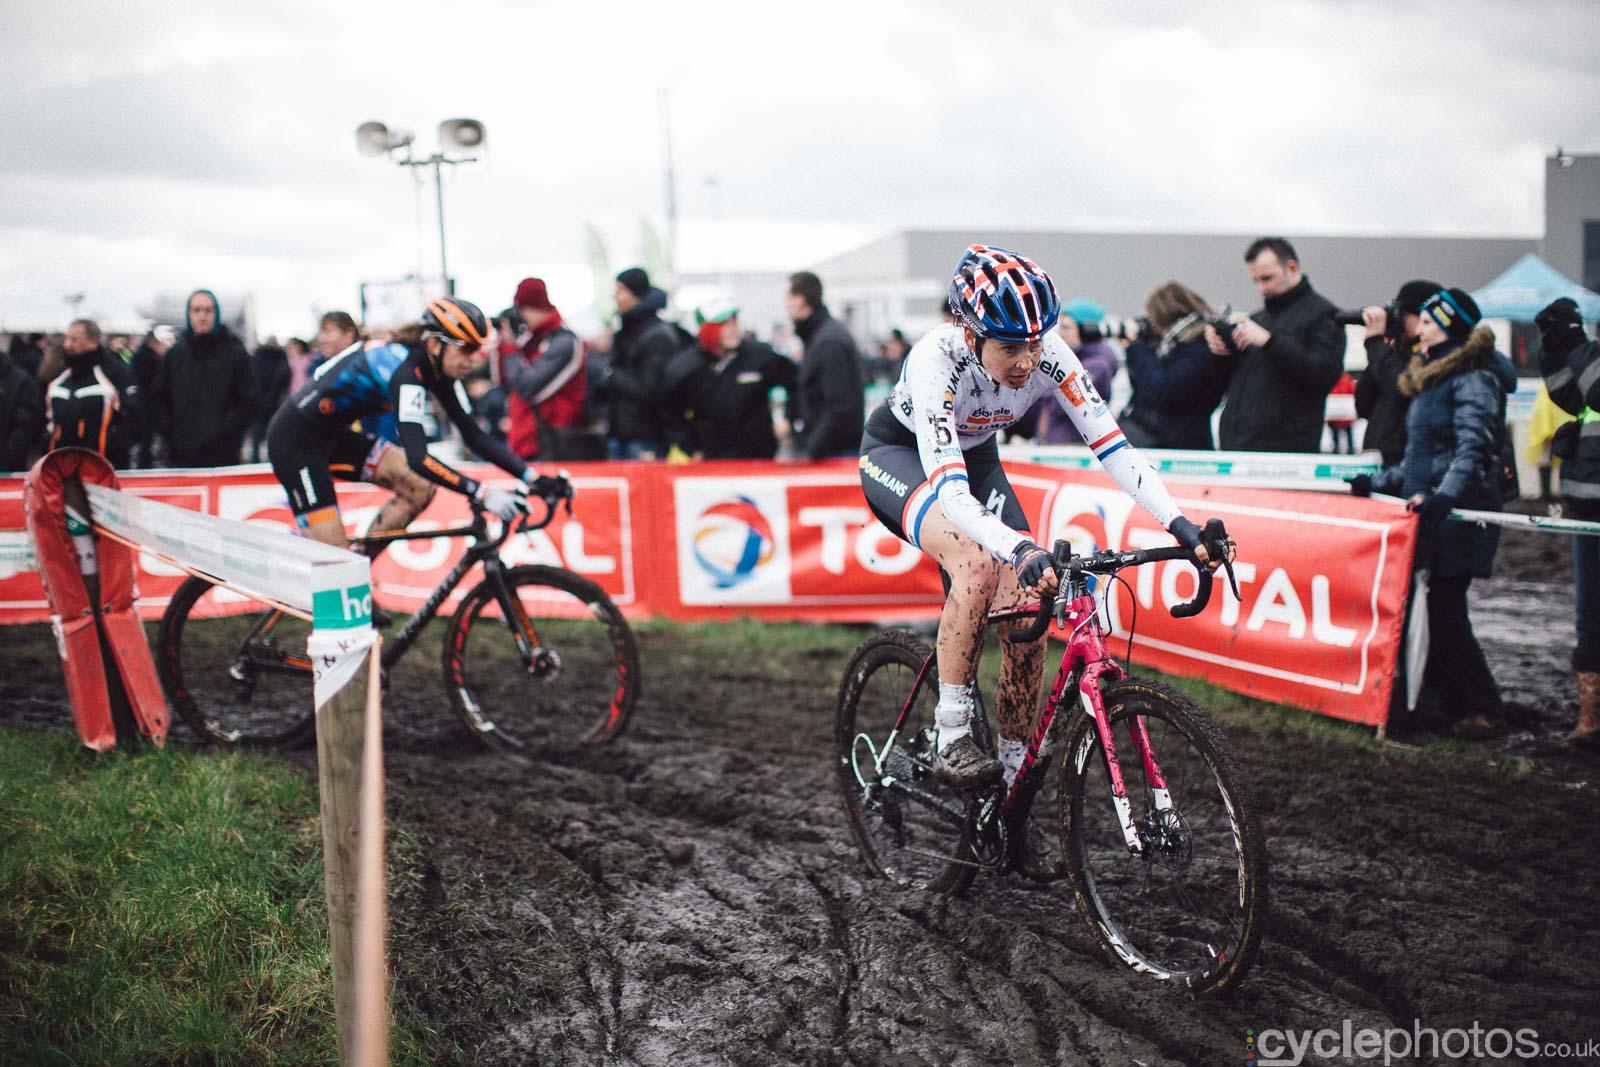 2016-cyclephotos-cyclocross-hoogstraten-135035-nikki-harris